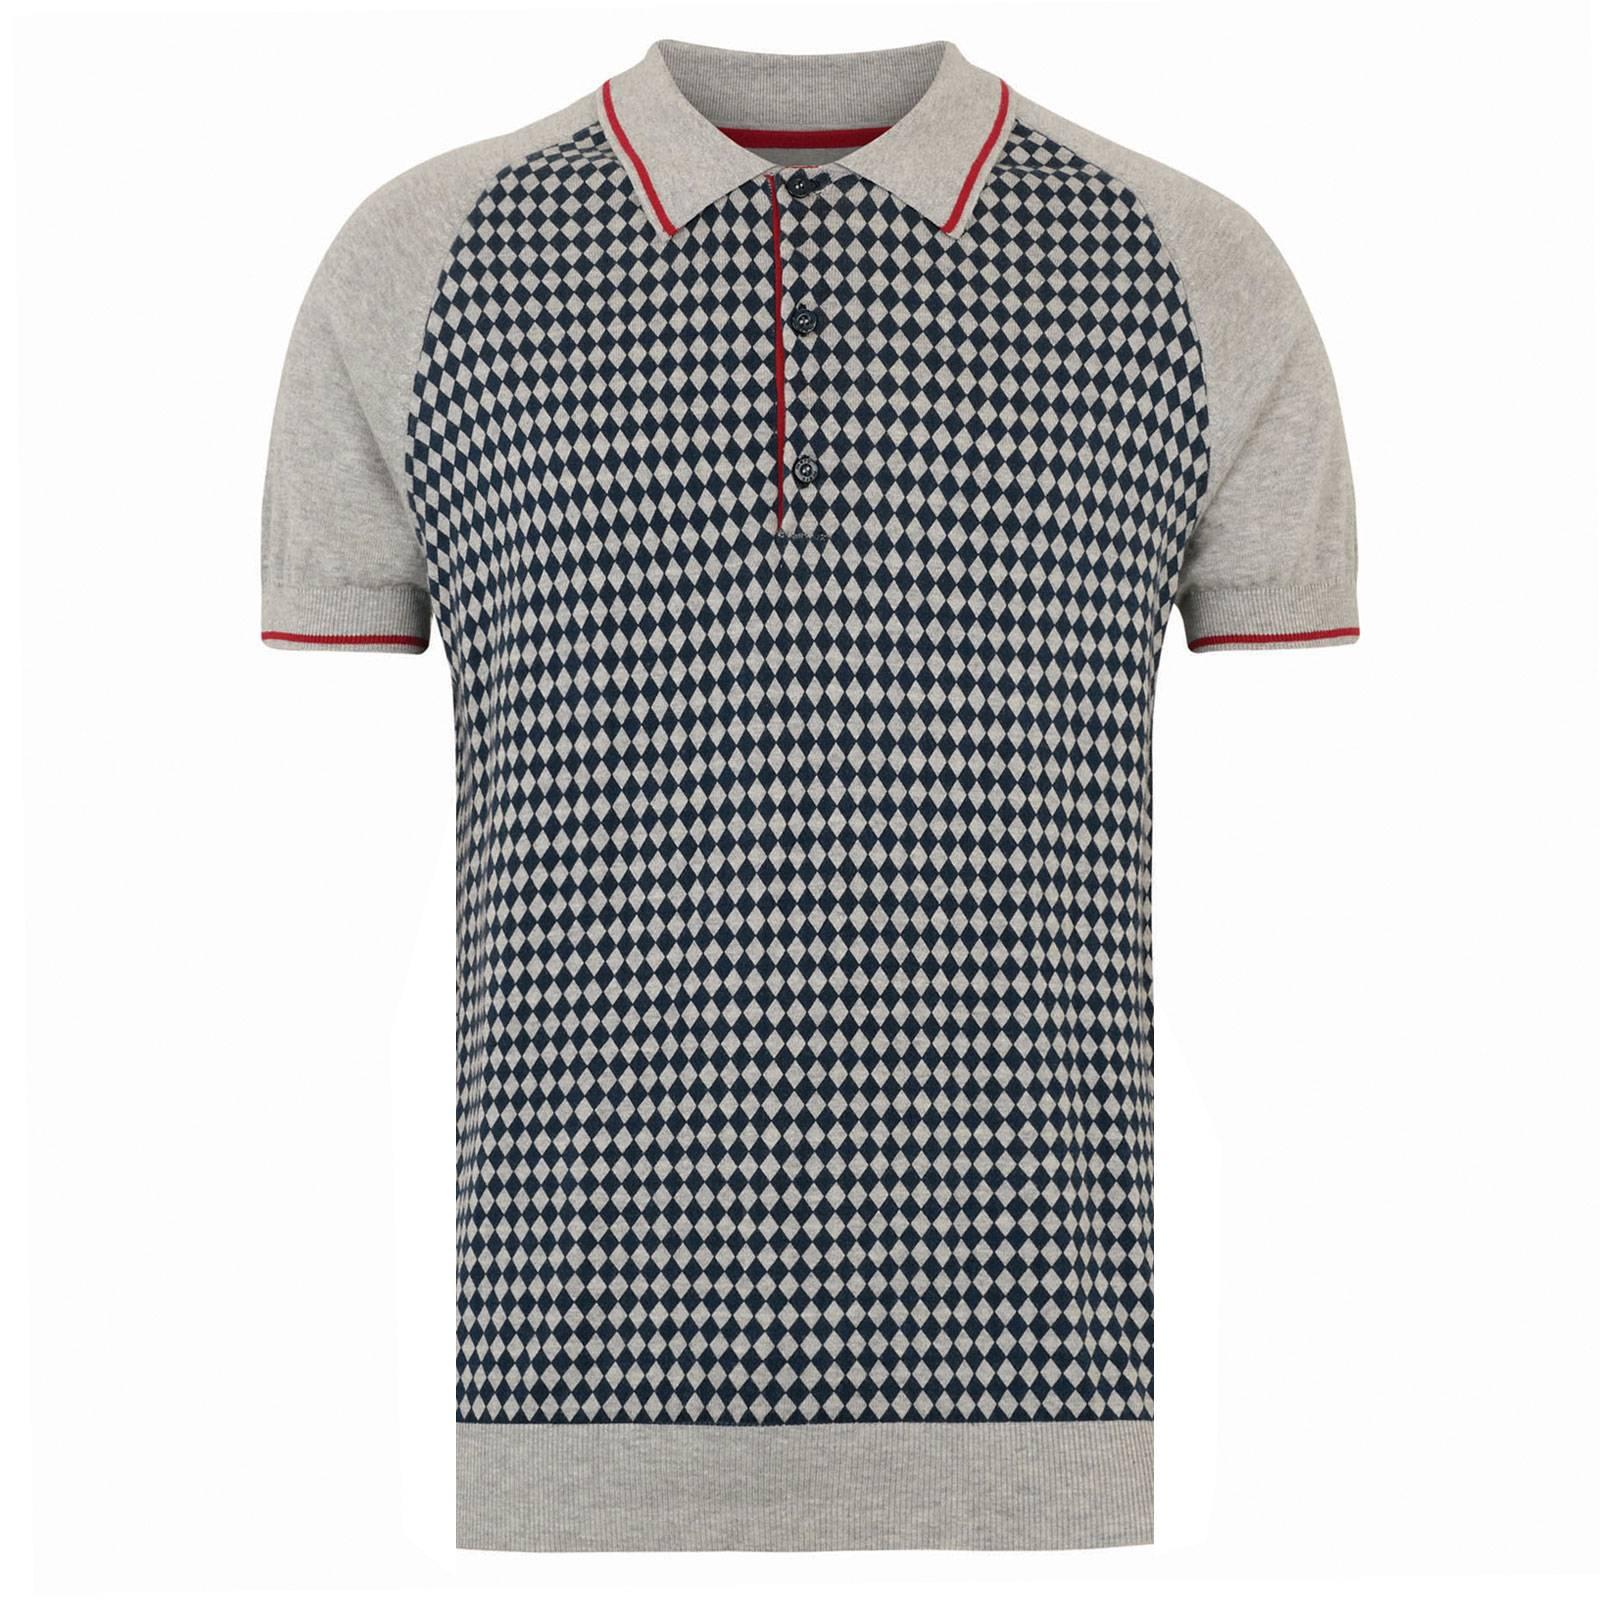 Рубашка Поло Leader от MercLondon